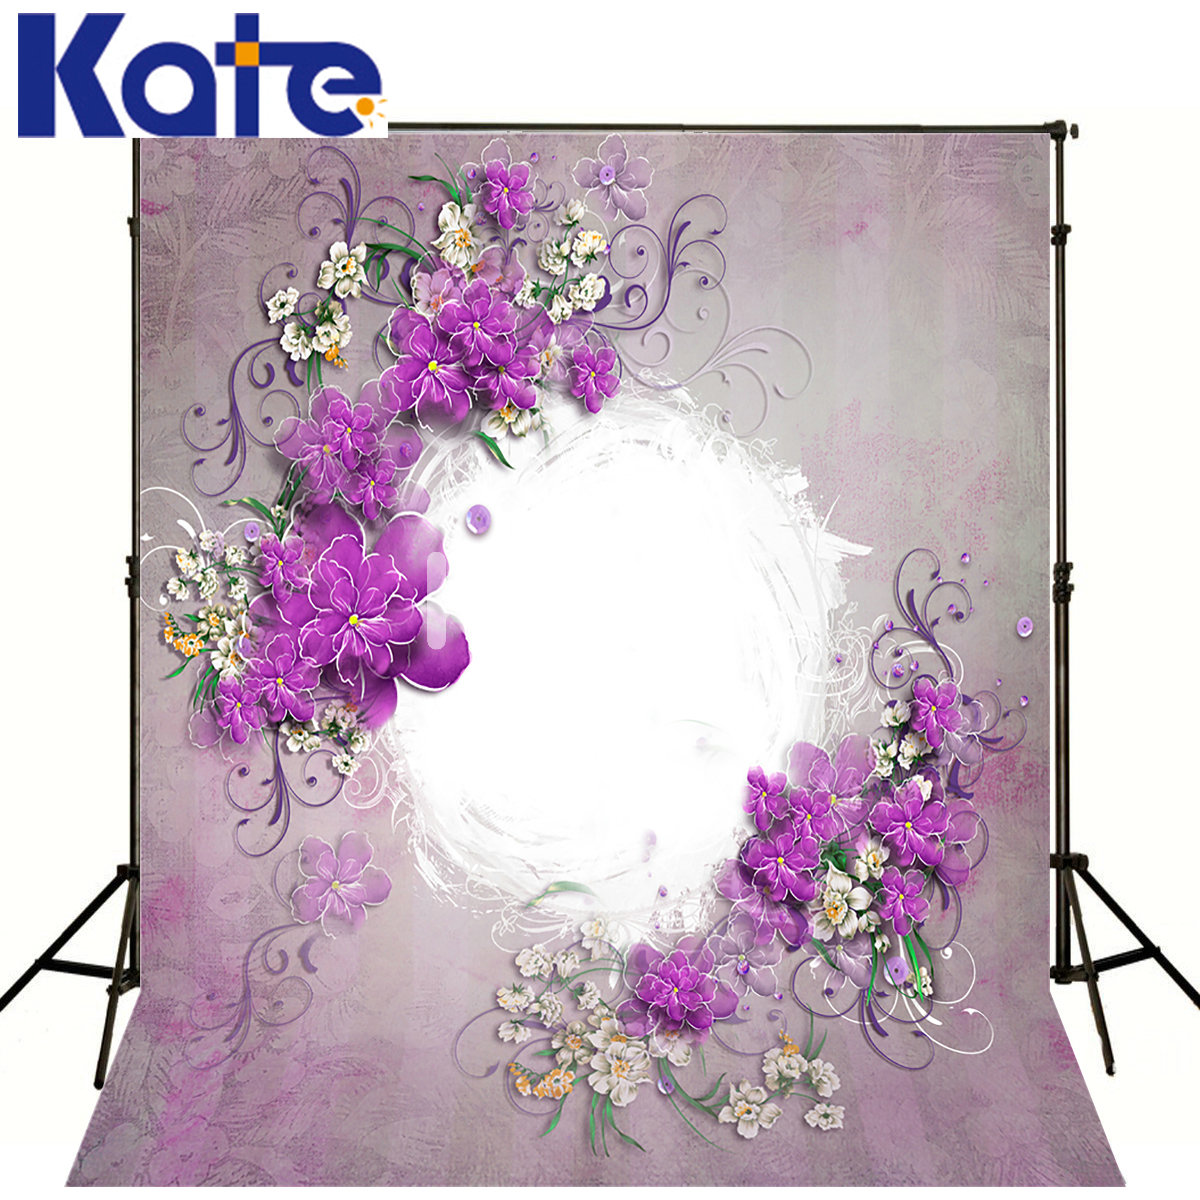 Kate Photography Backdrops Fotografia Big Red Flower Purple Dream Kate Background Backdrop our kate